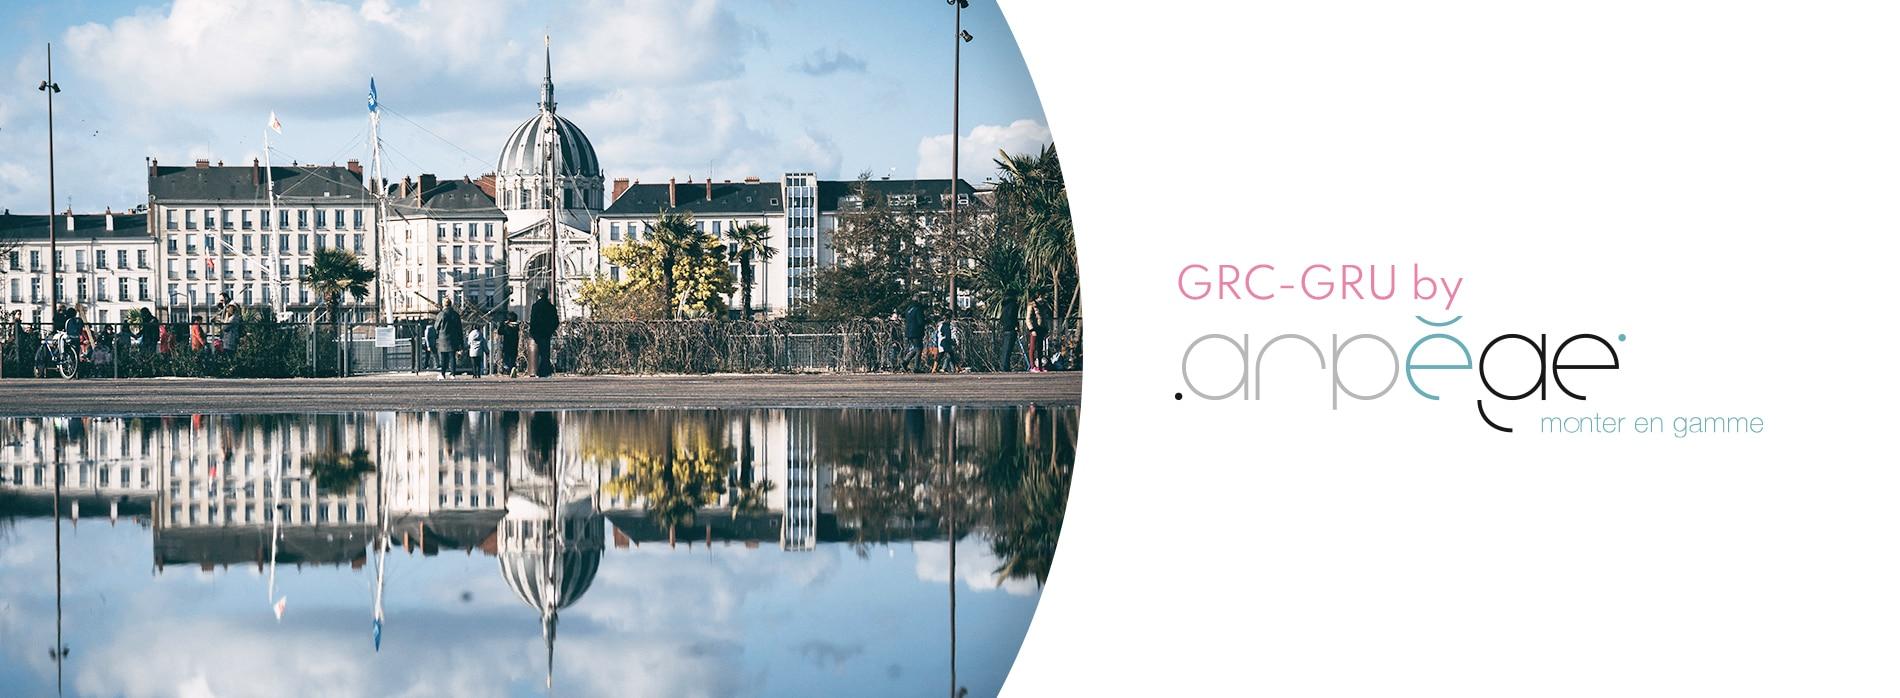 Site GRC GRU Arpege